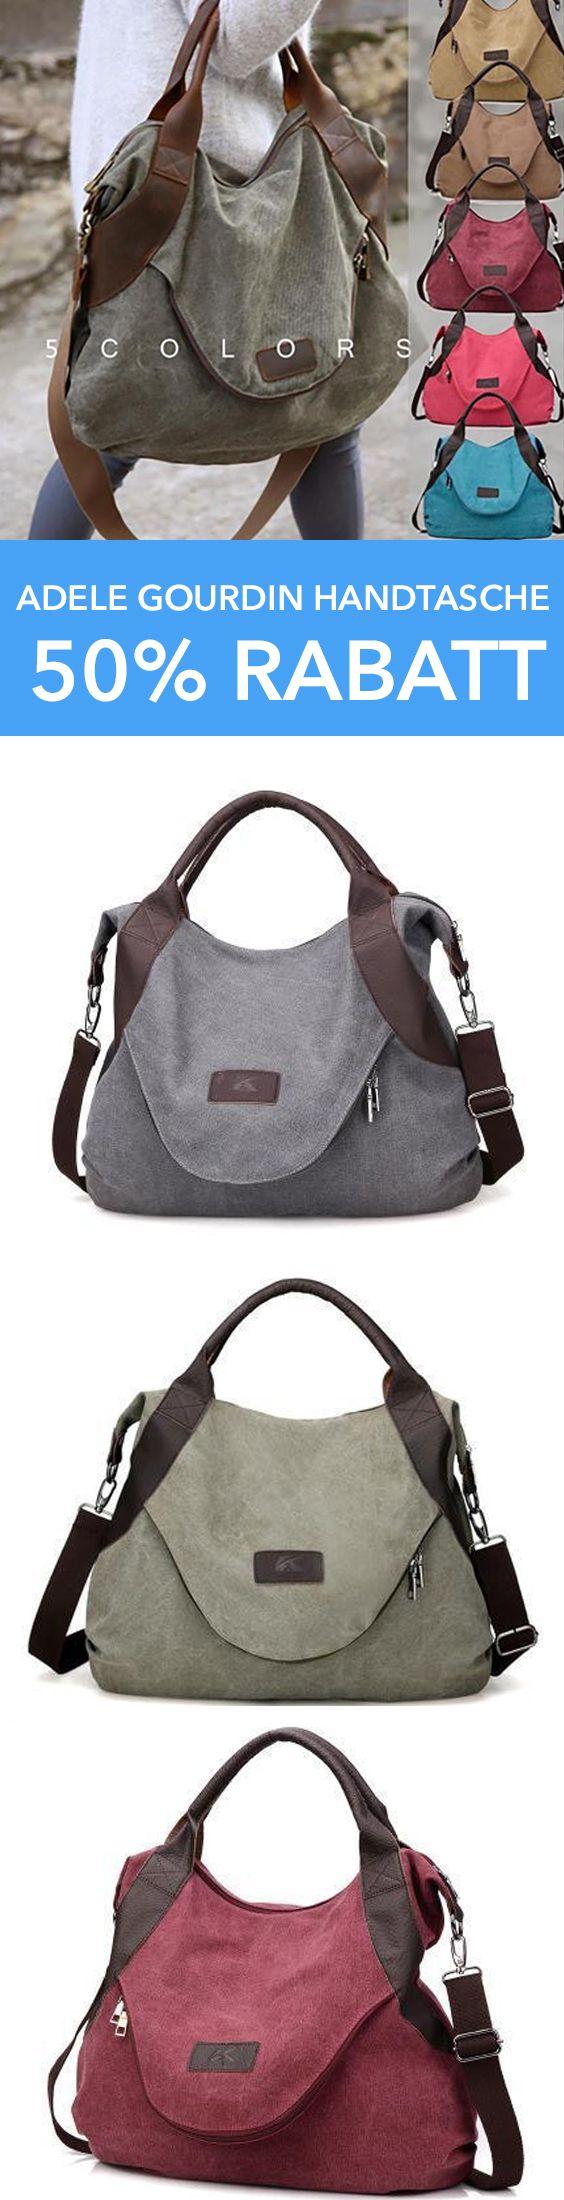 Frauen Messenger Tasche